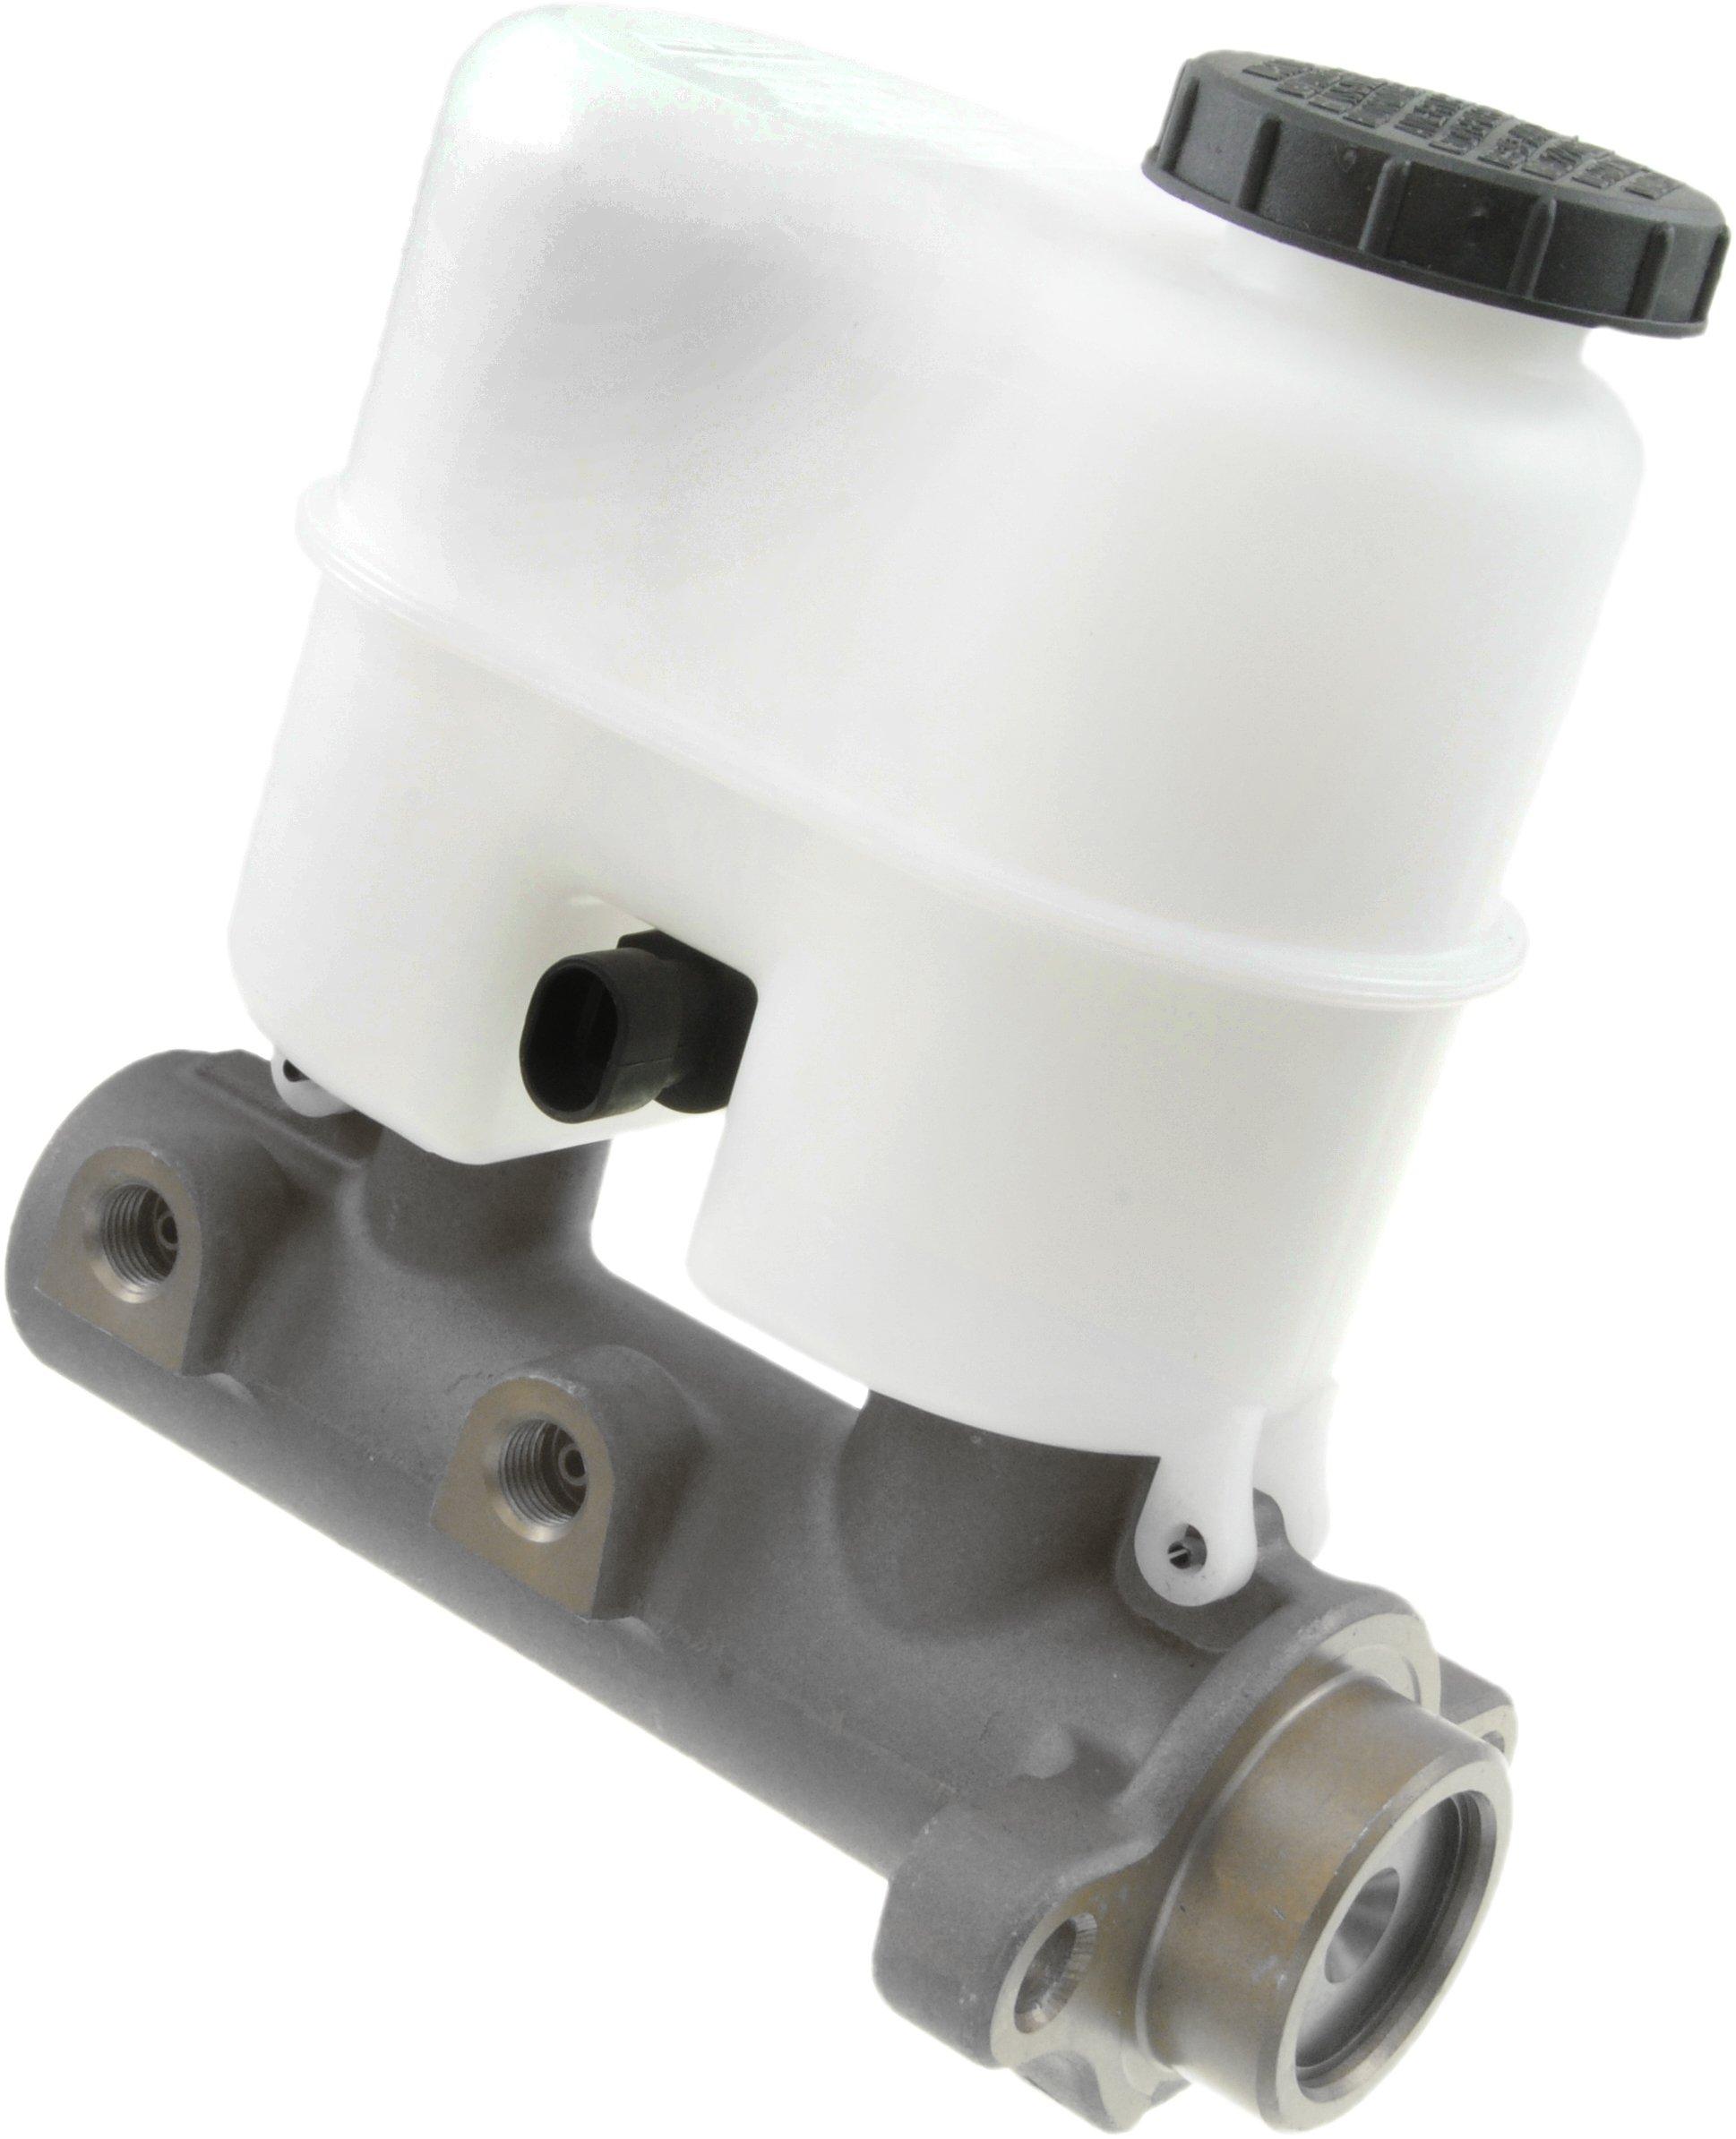 Dorman M630031 New Brake Master Cylinder